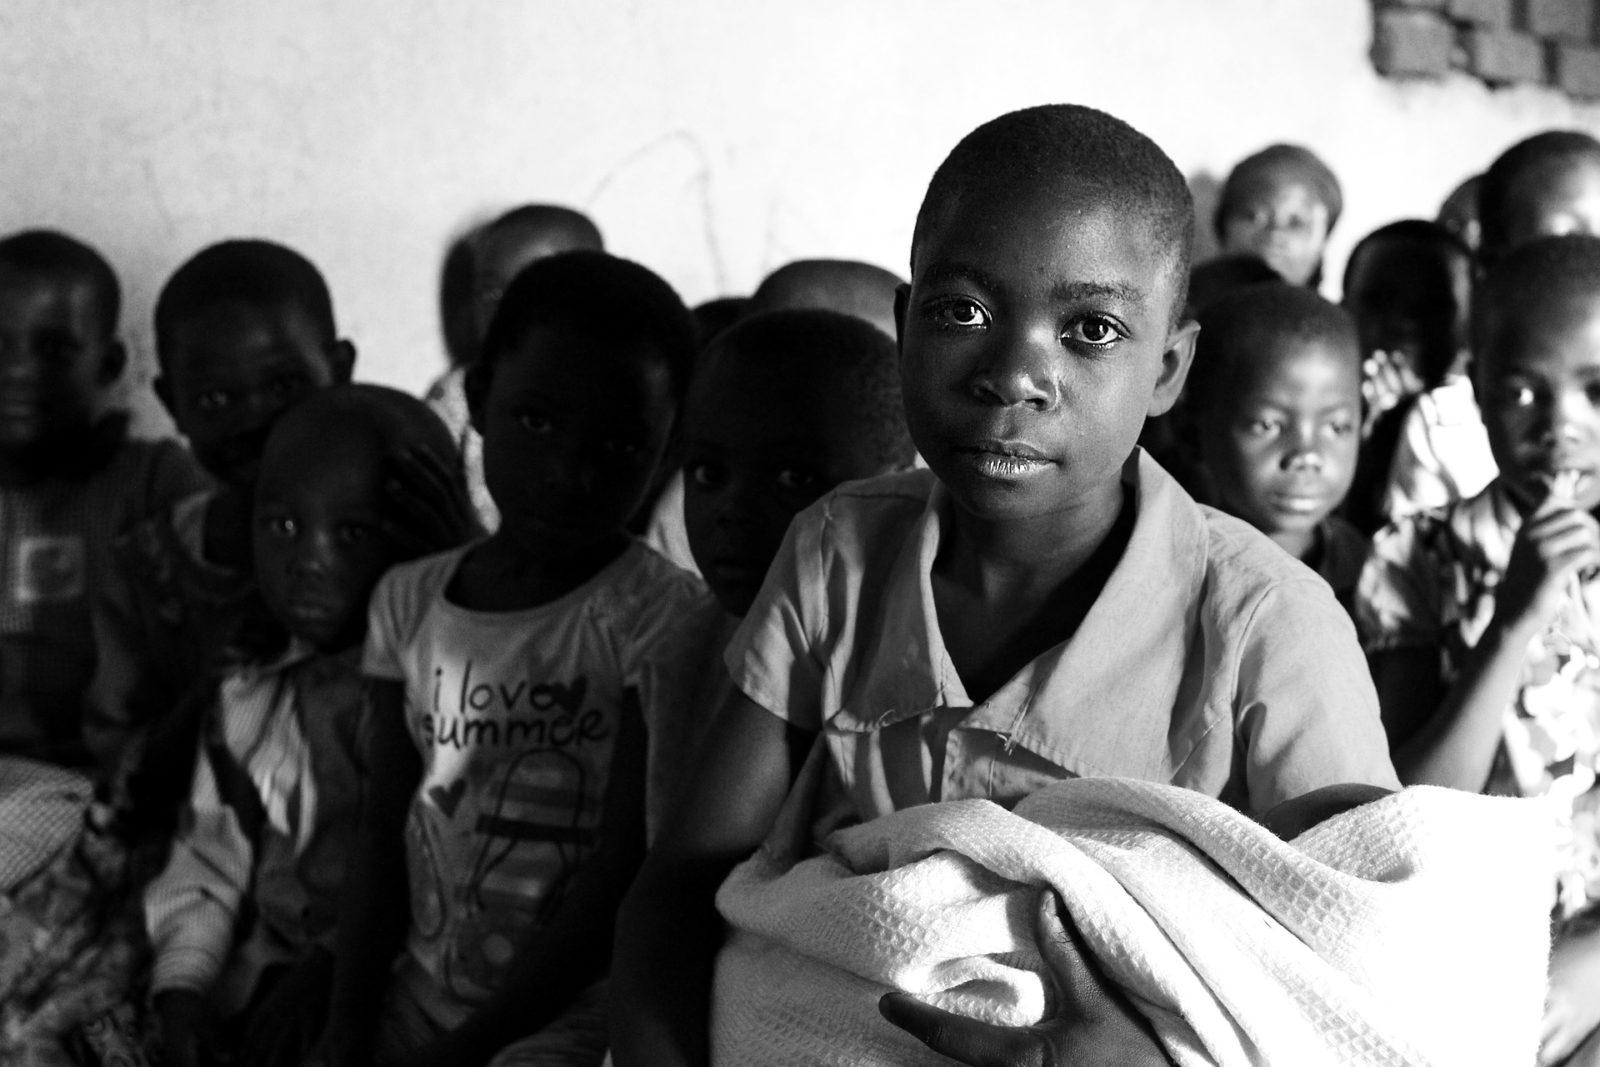 children-of-uganda-2245270_1920